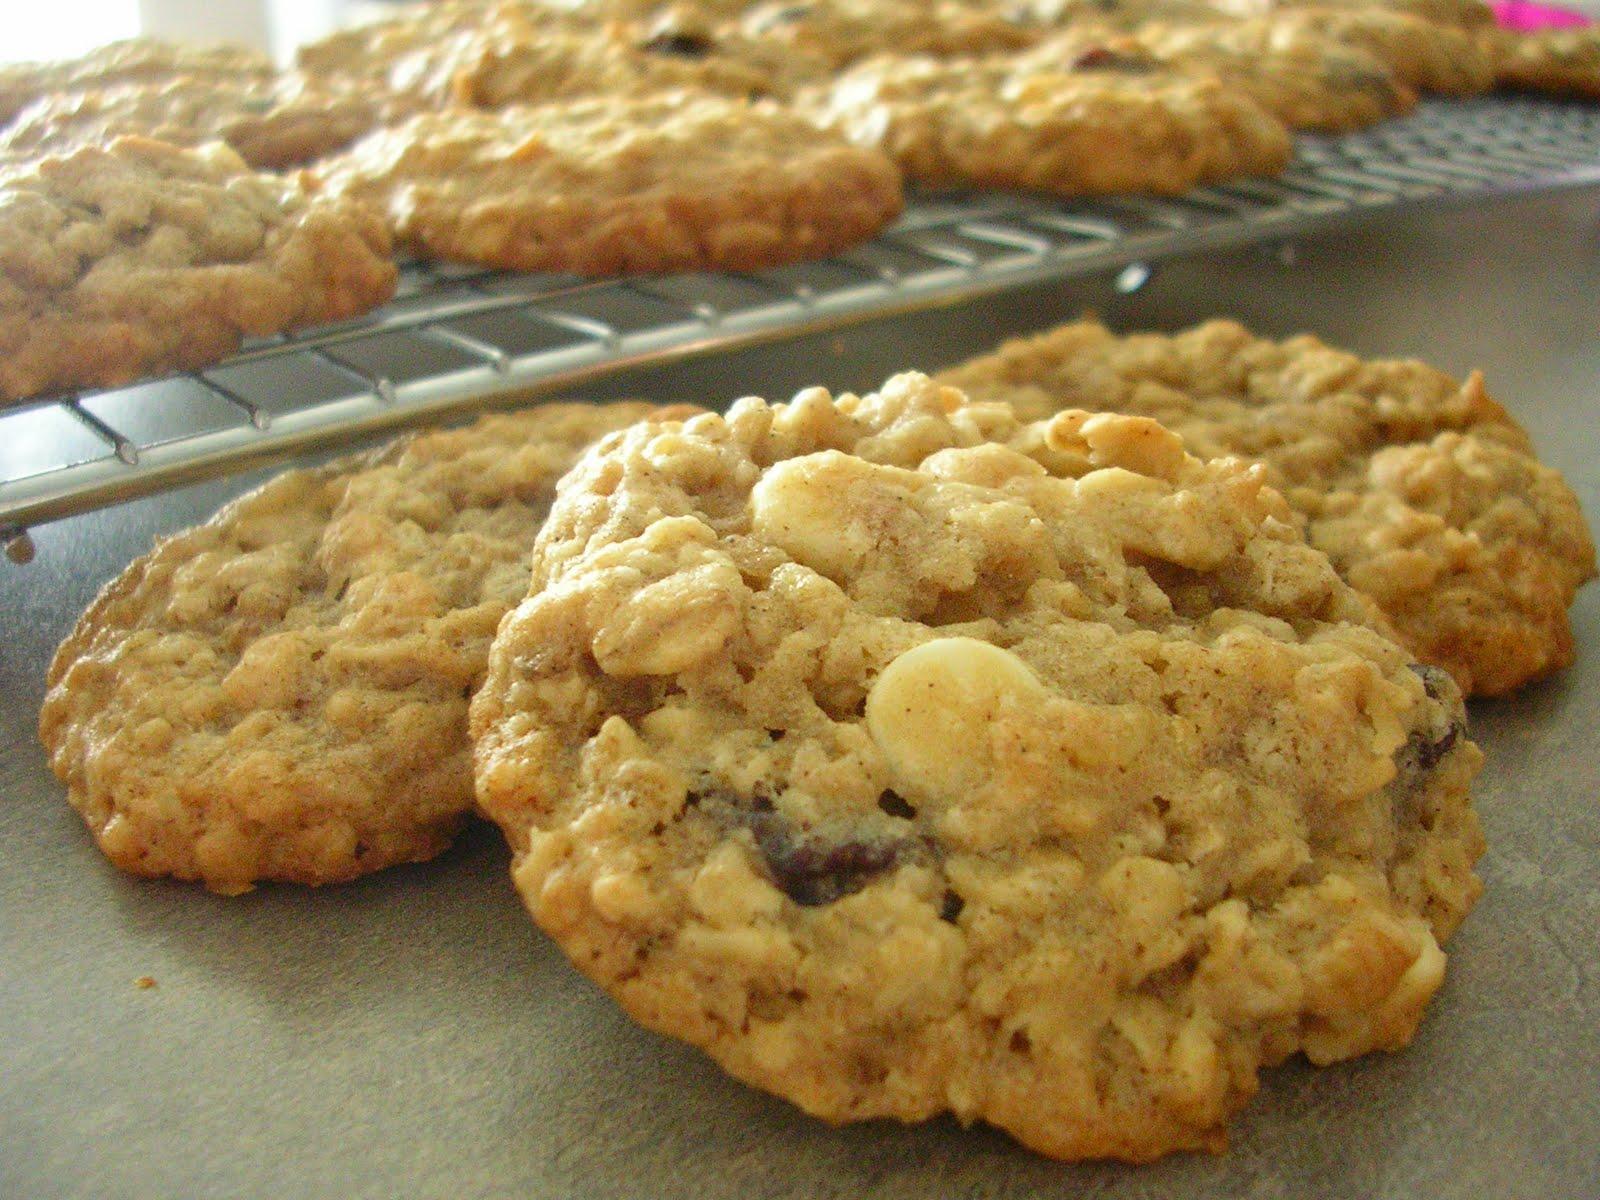 chocolate chip cookies chocolate oatmeal cookies oatmeal chocolate ...